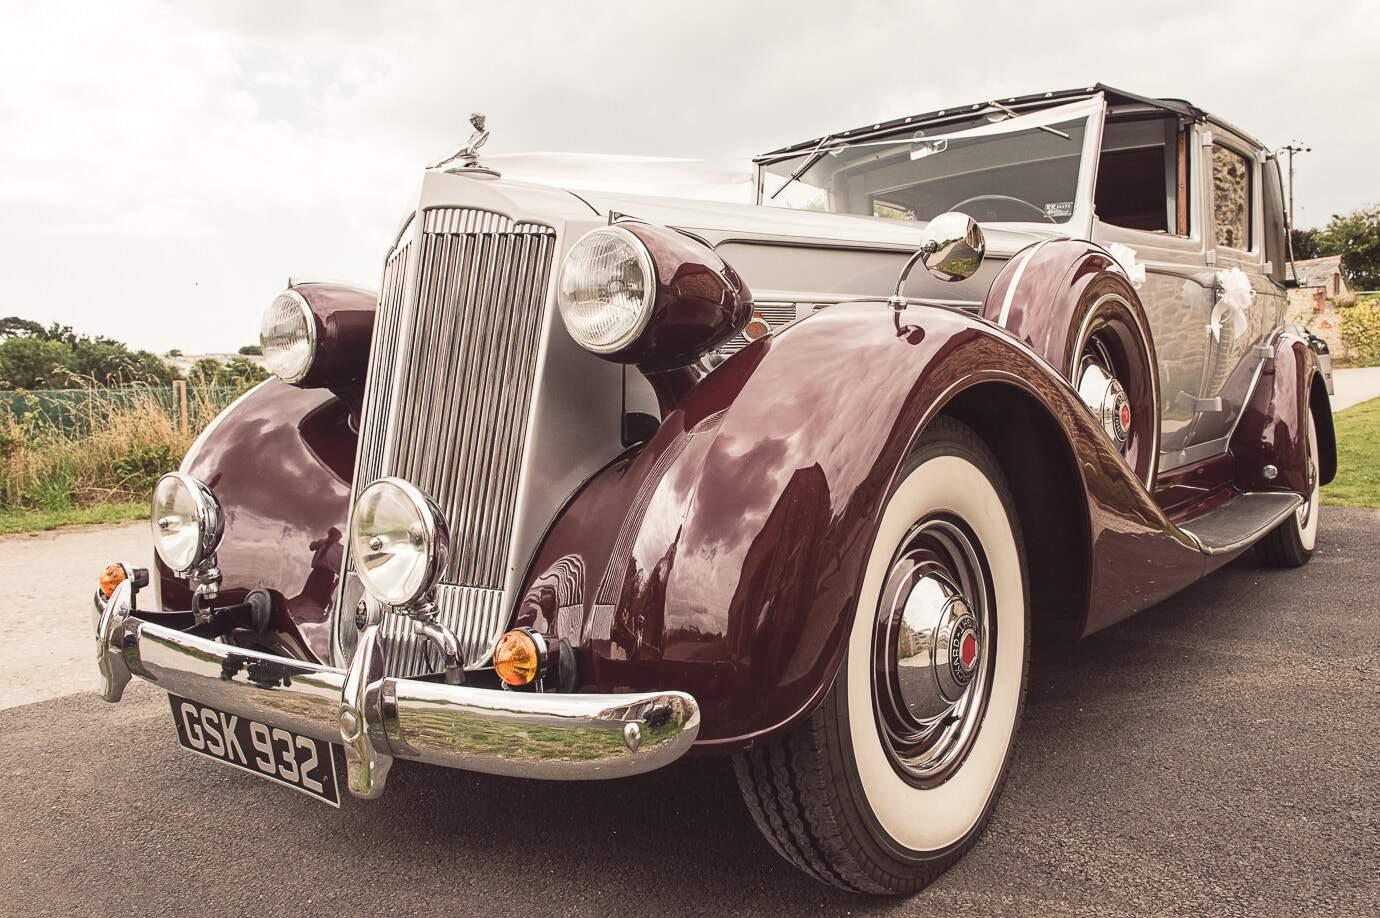 Packard Super Eight wedding car photo by Lulworth Castle wedding photographers